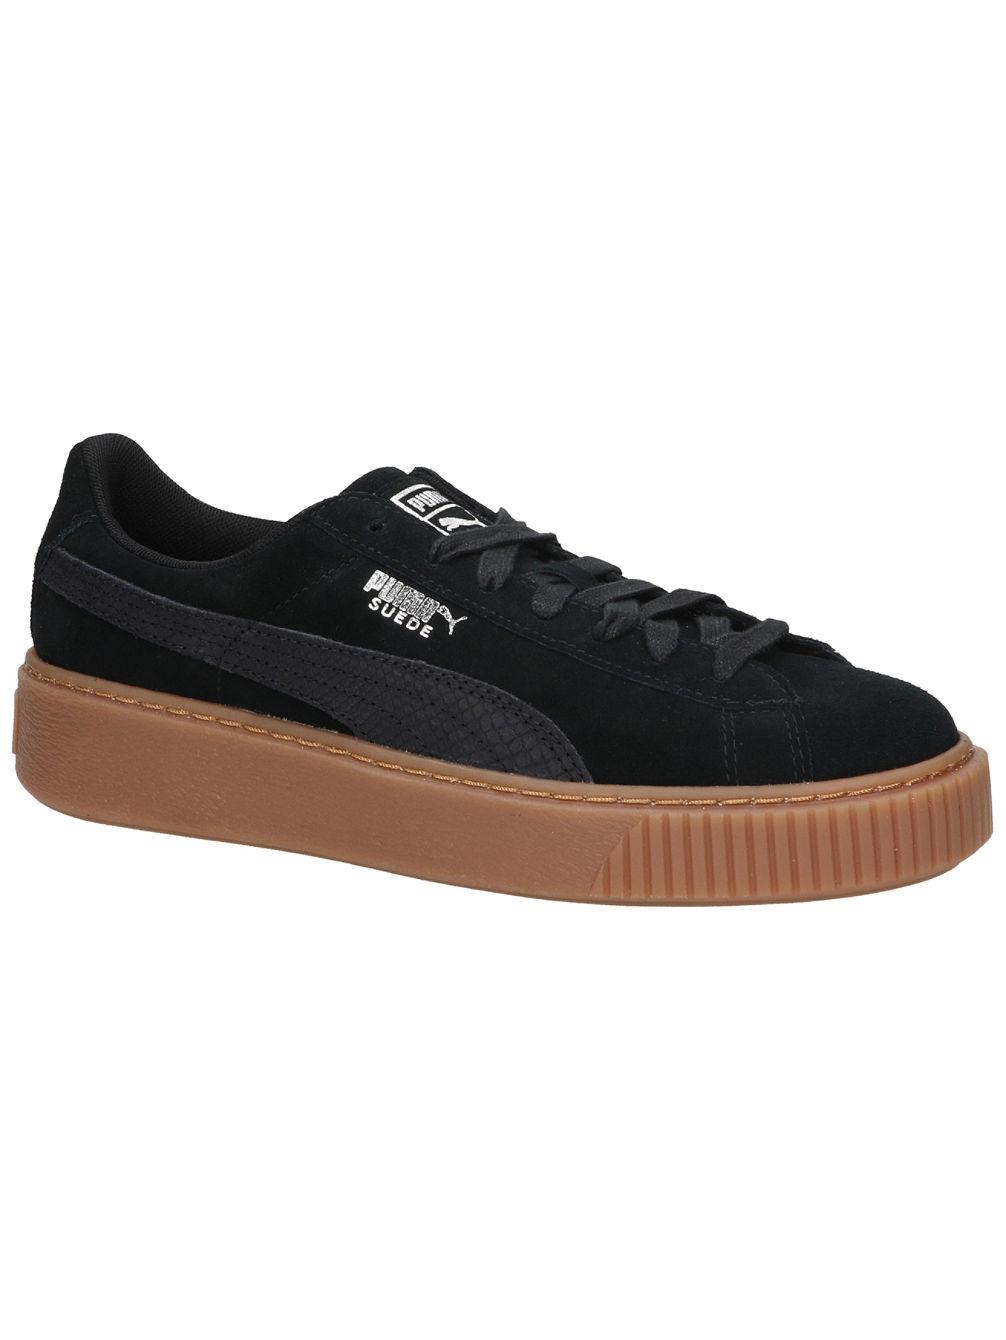 69b448bc5e5 Buy Puma Basket Platform Animal Sneakers online at blue-tomato.com